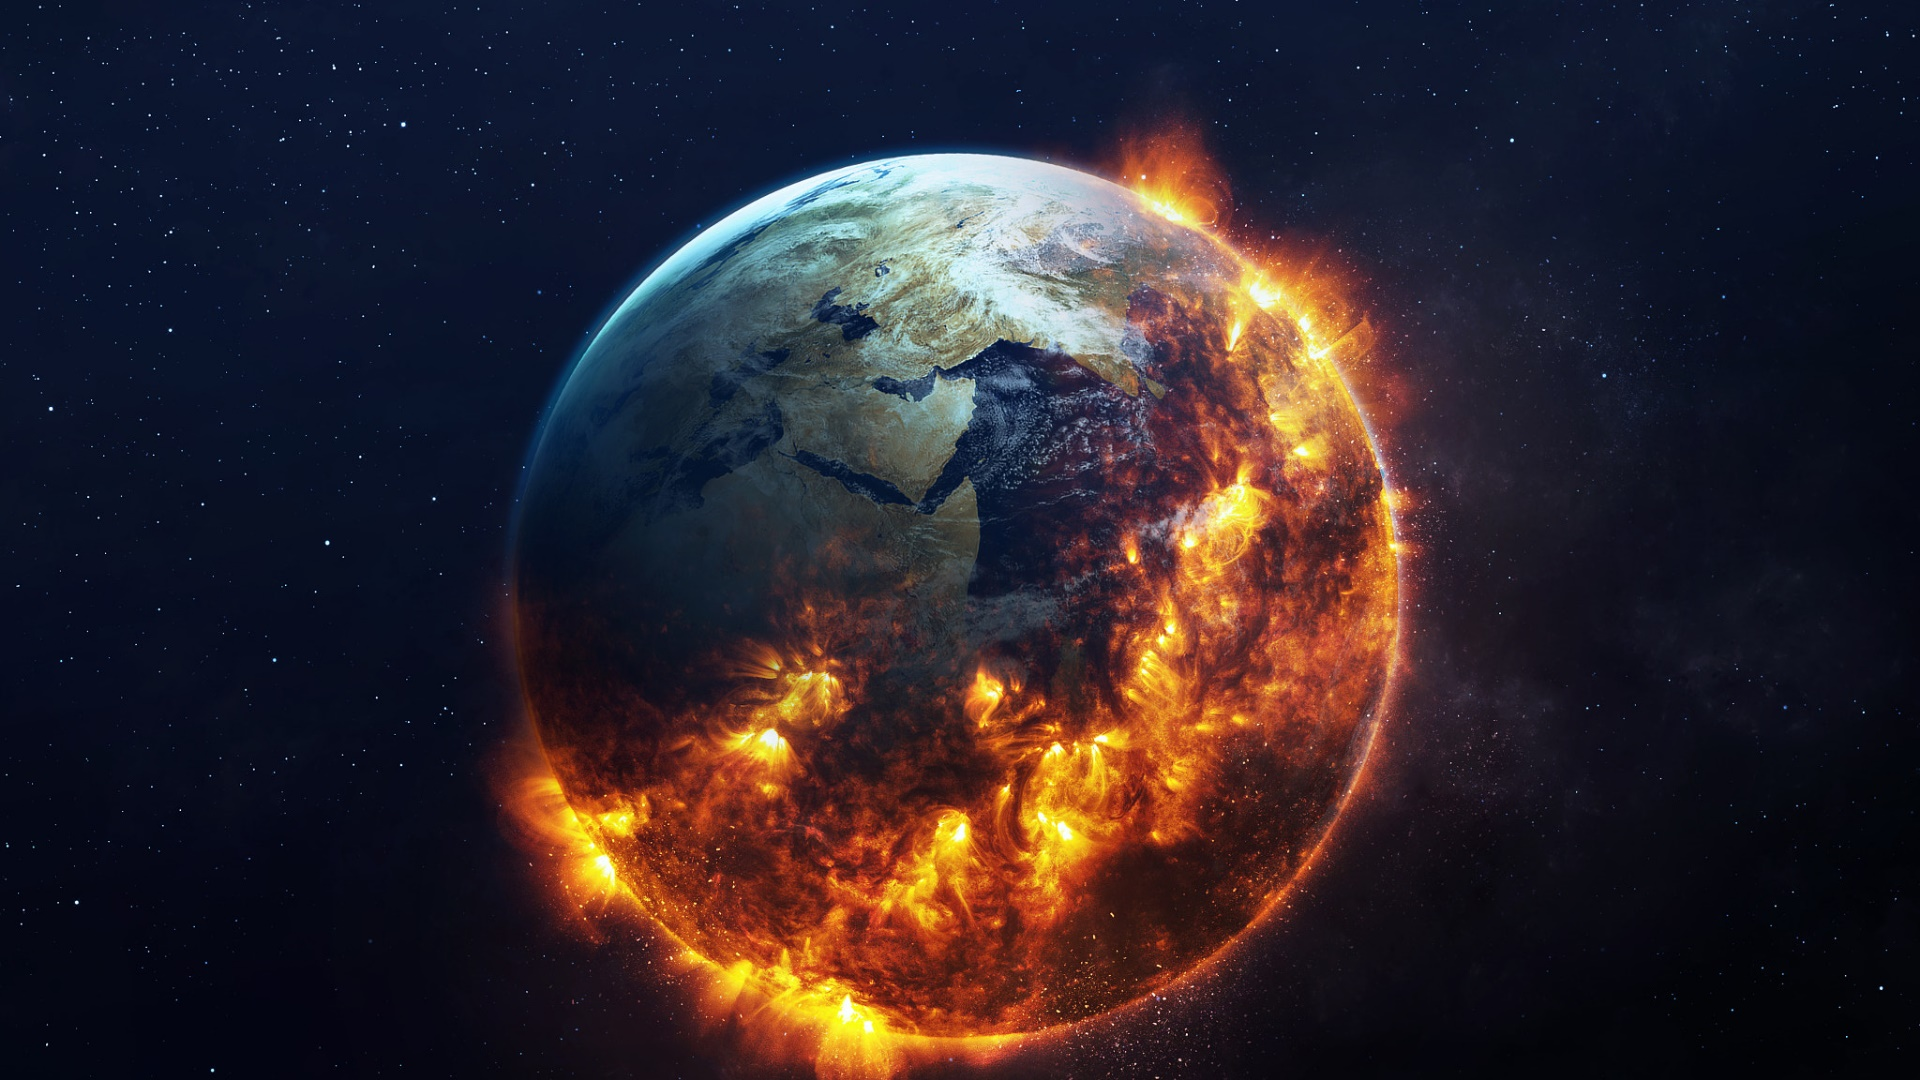 Apocalyptic Earth Hd Wallpaper Backiee Free Ultra Hd Wallpaper